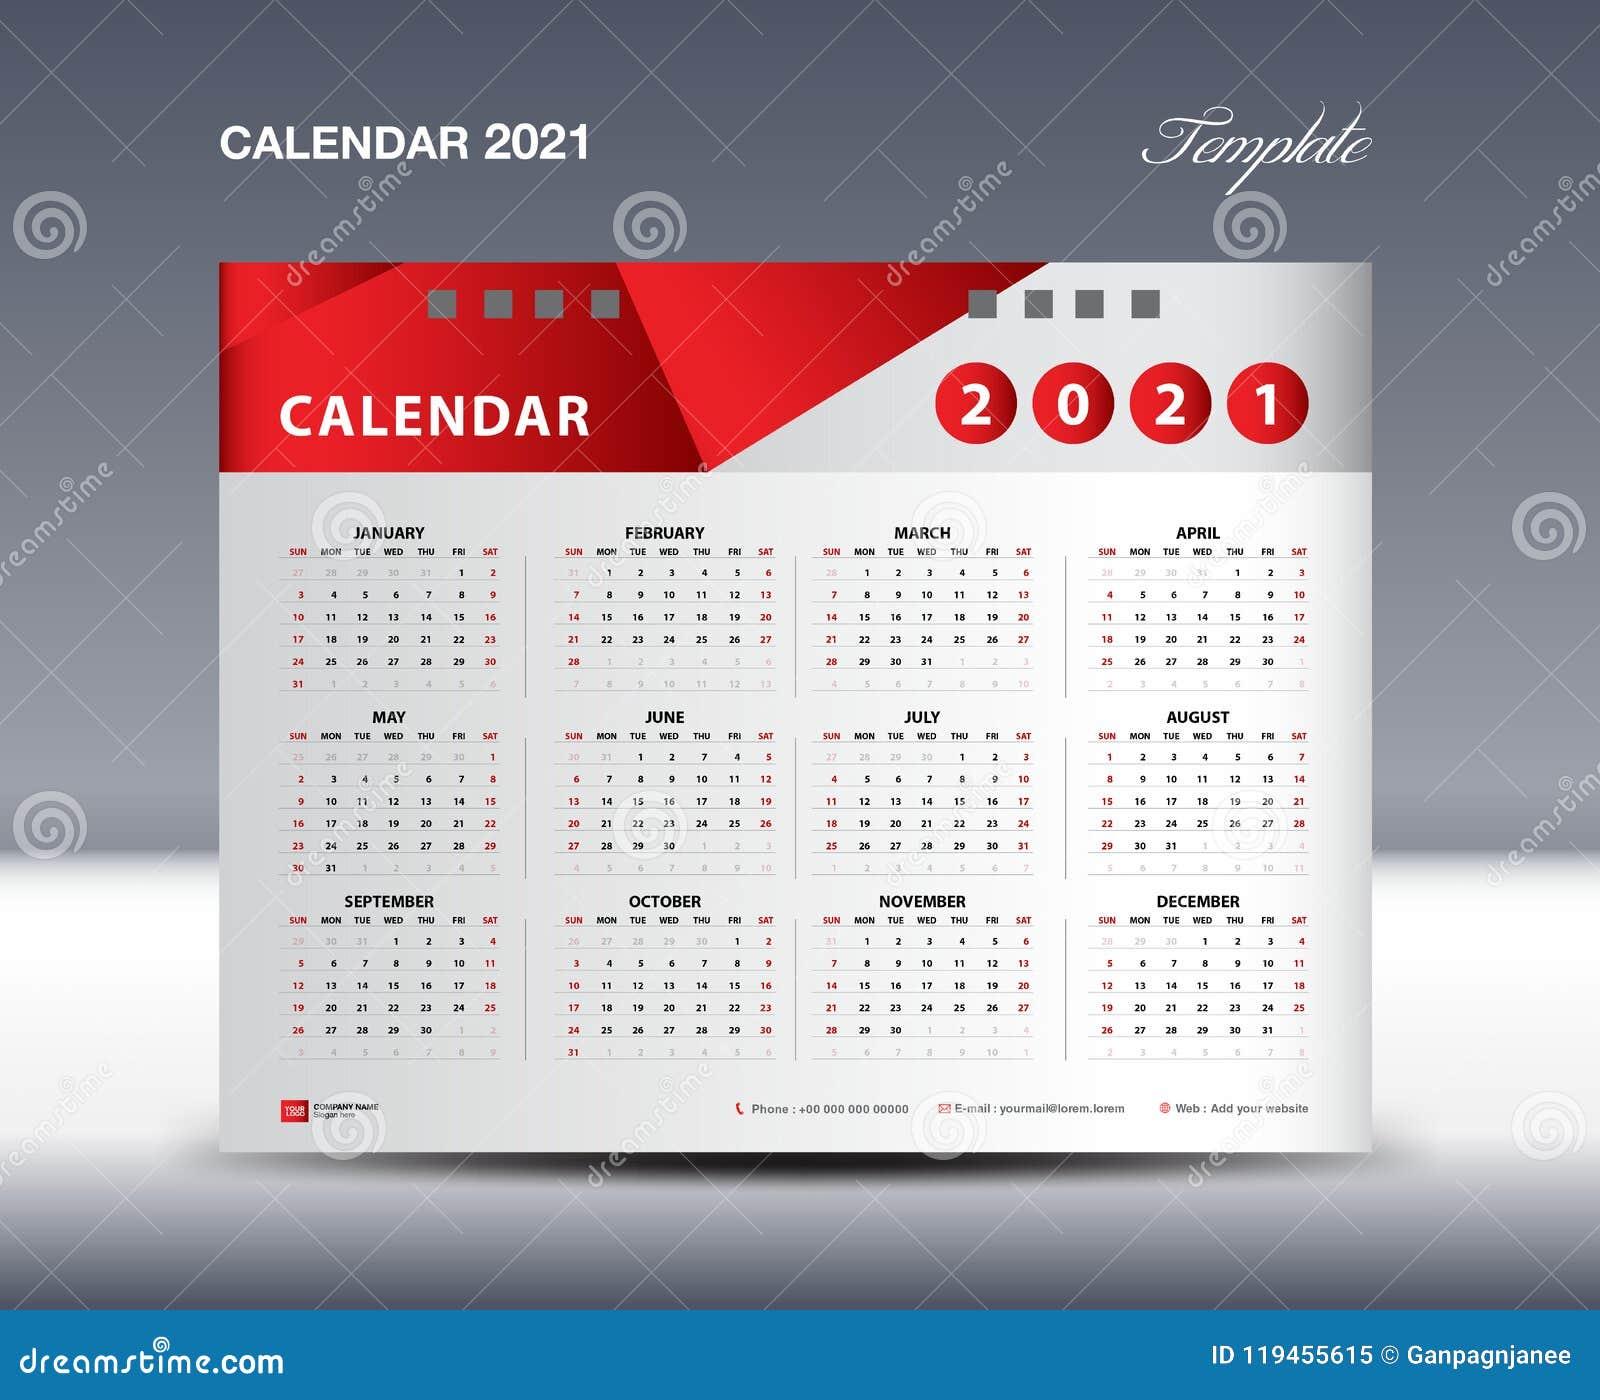 Calendar 2021 Template vector, Week starts Sunday, Stationery design, flyer design vector, printing media creative idea design